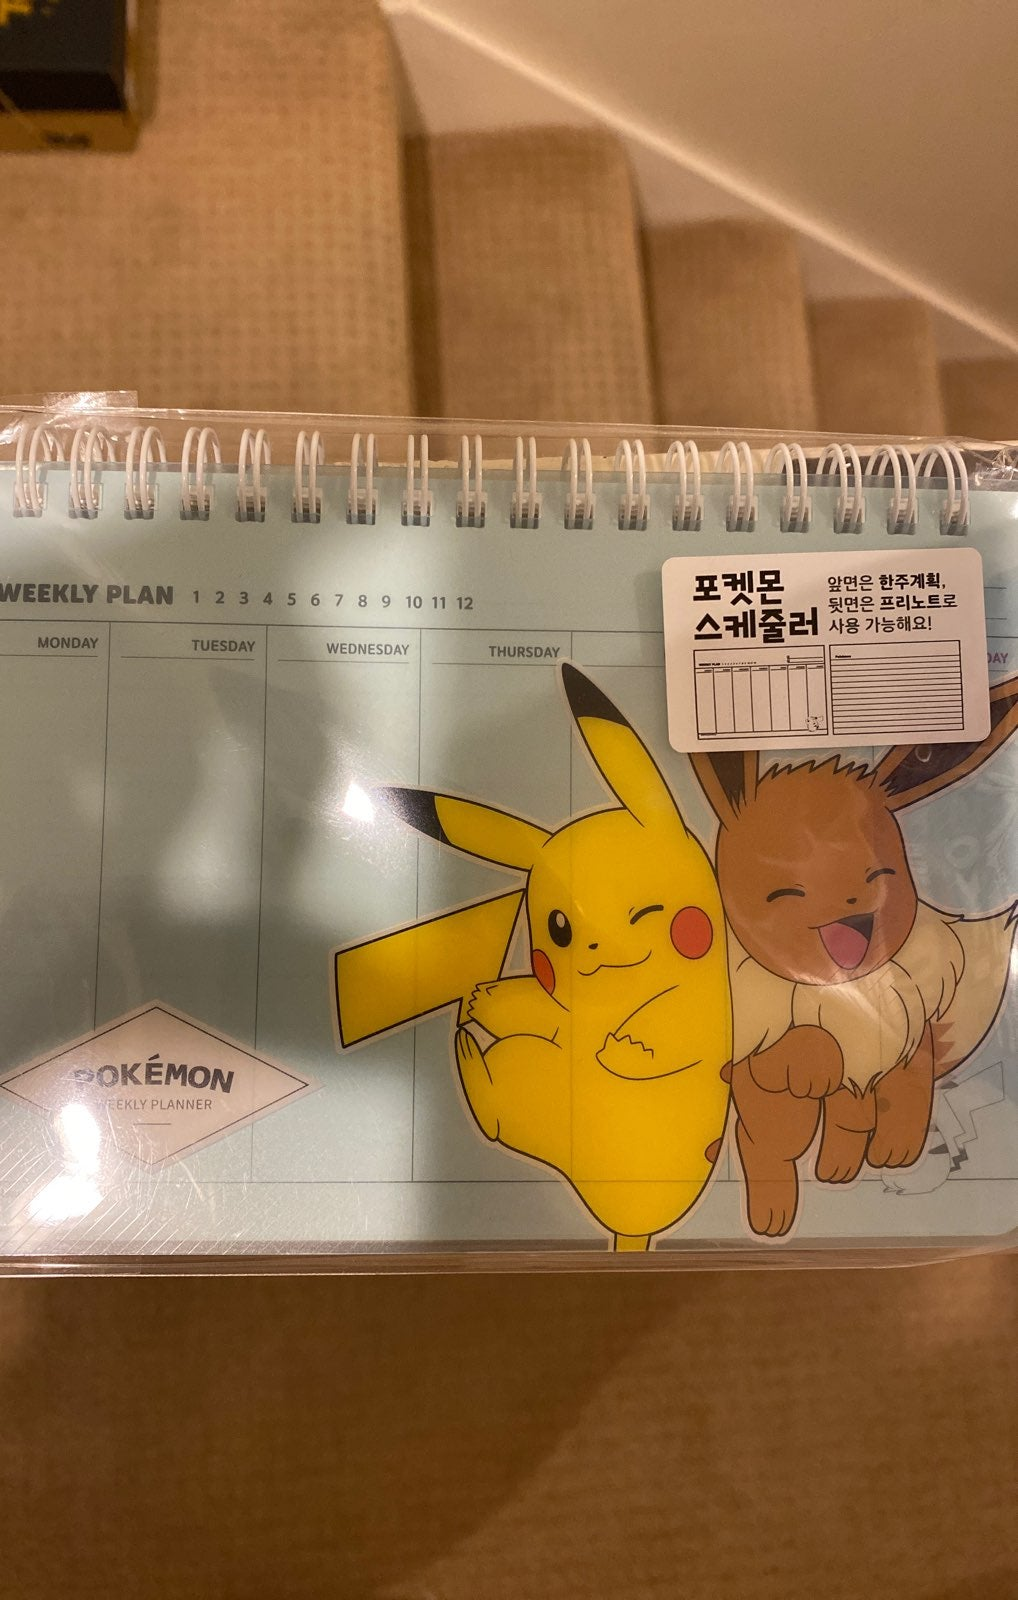 Pokemon weekly planner